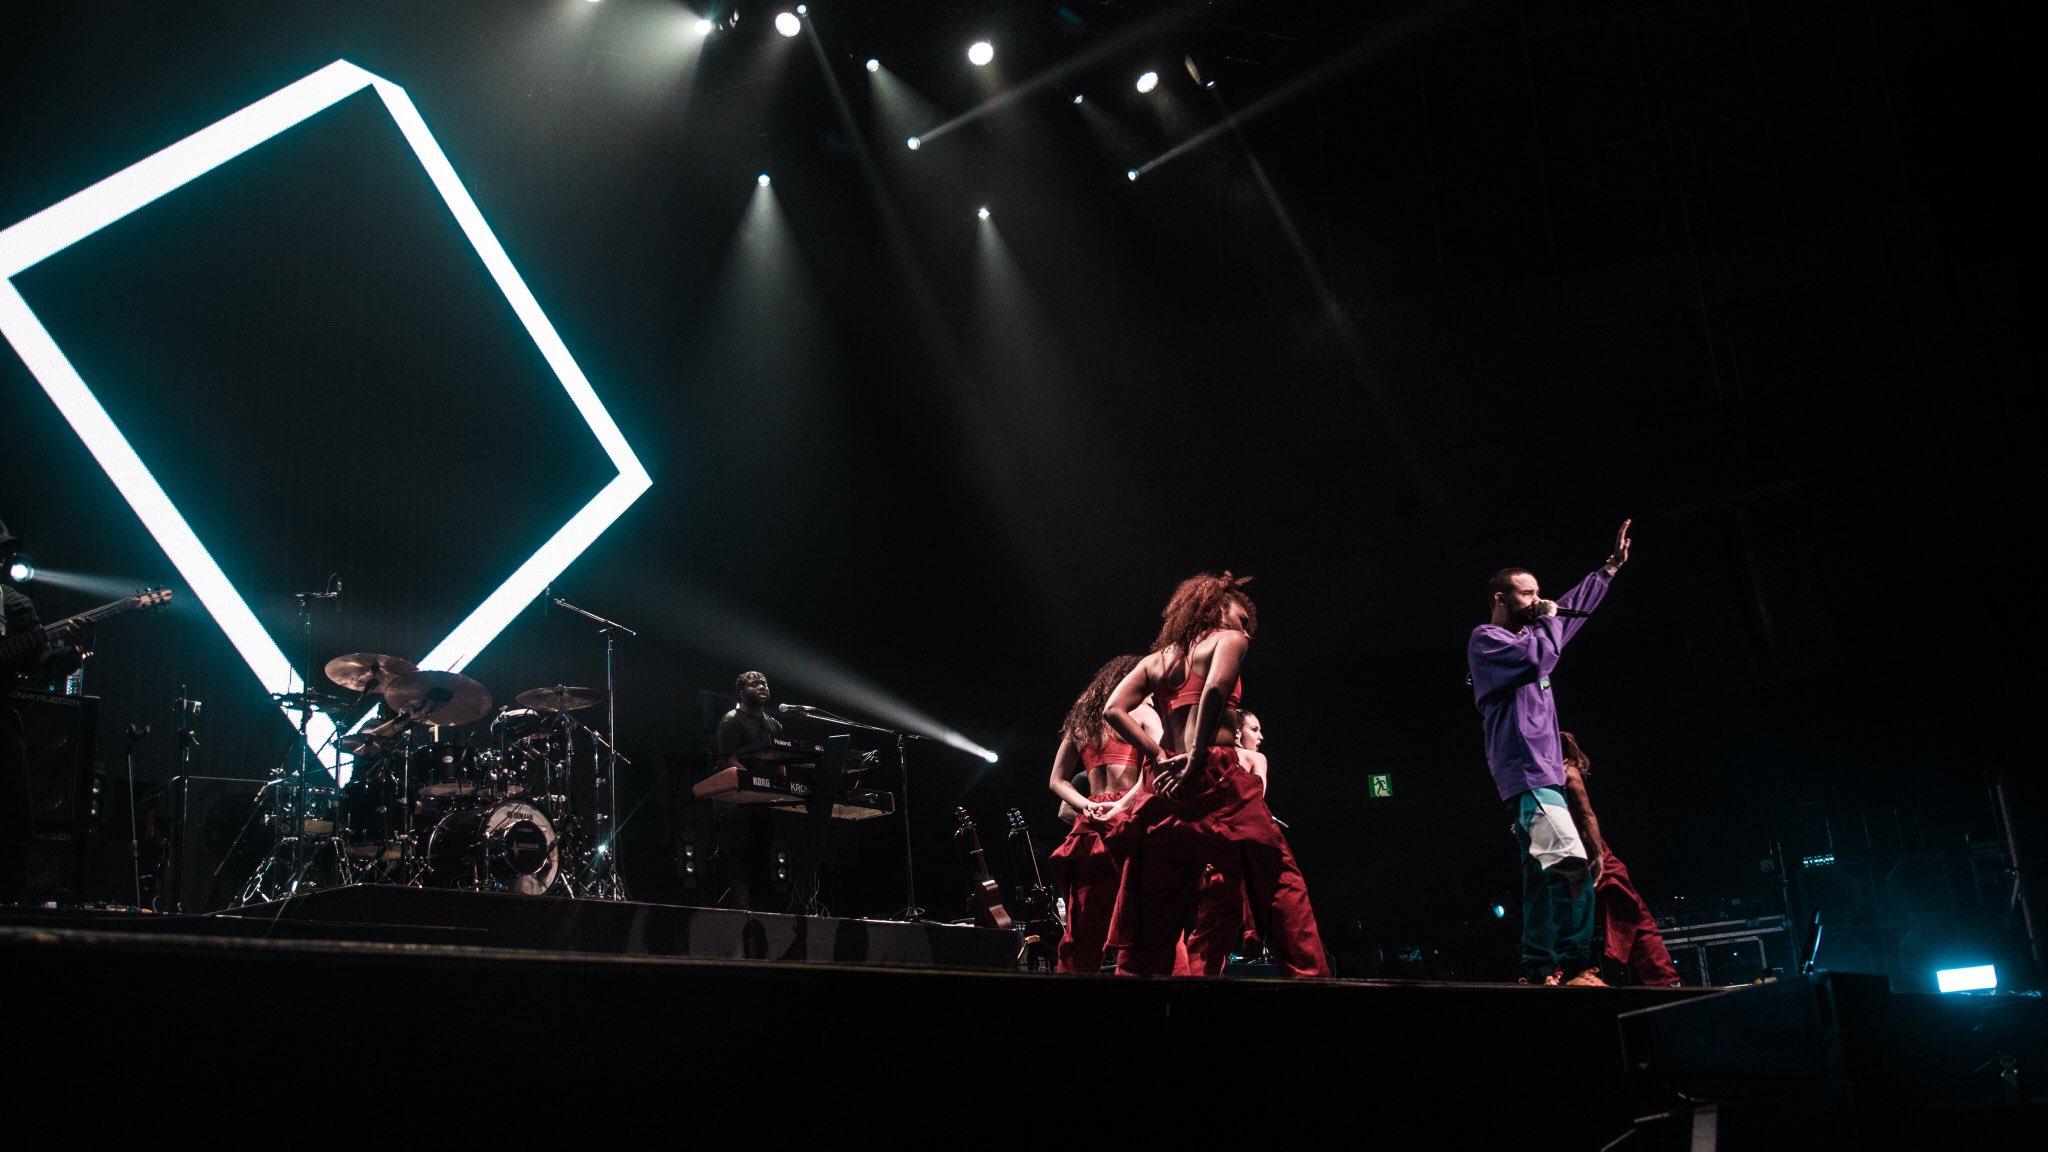 Kobe thank you �������� it was fun ���� #POPSPRING2018 https://t.co/PchAkiROrw